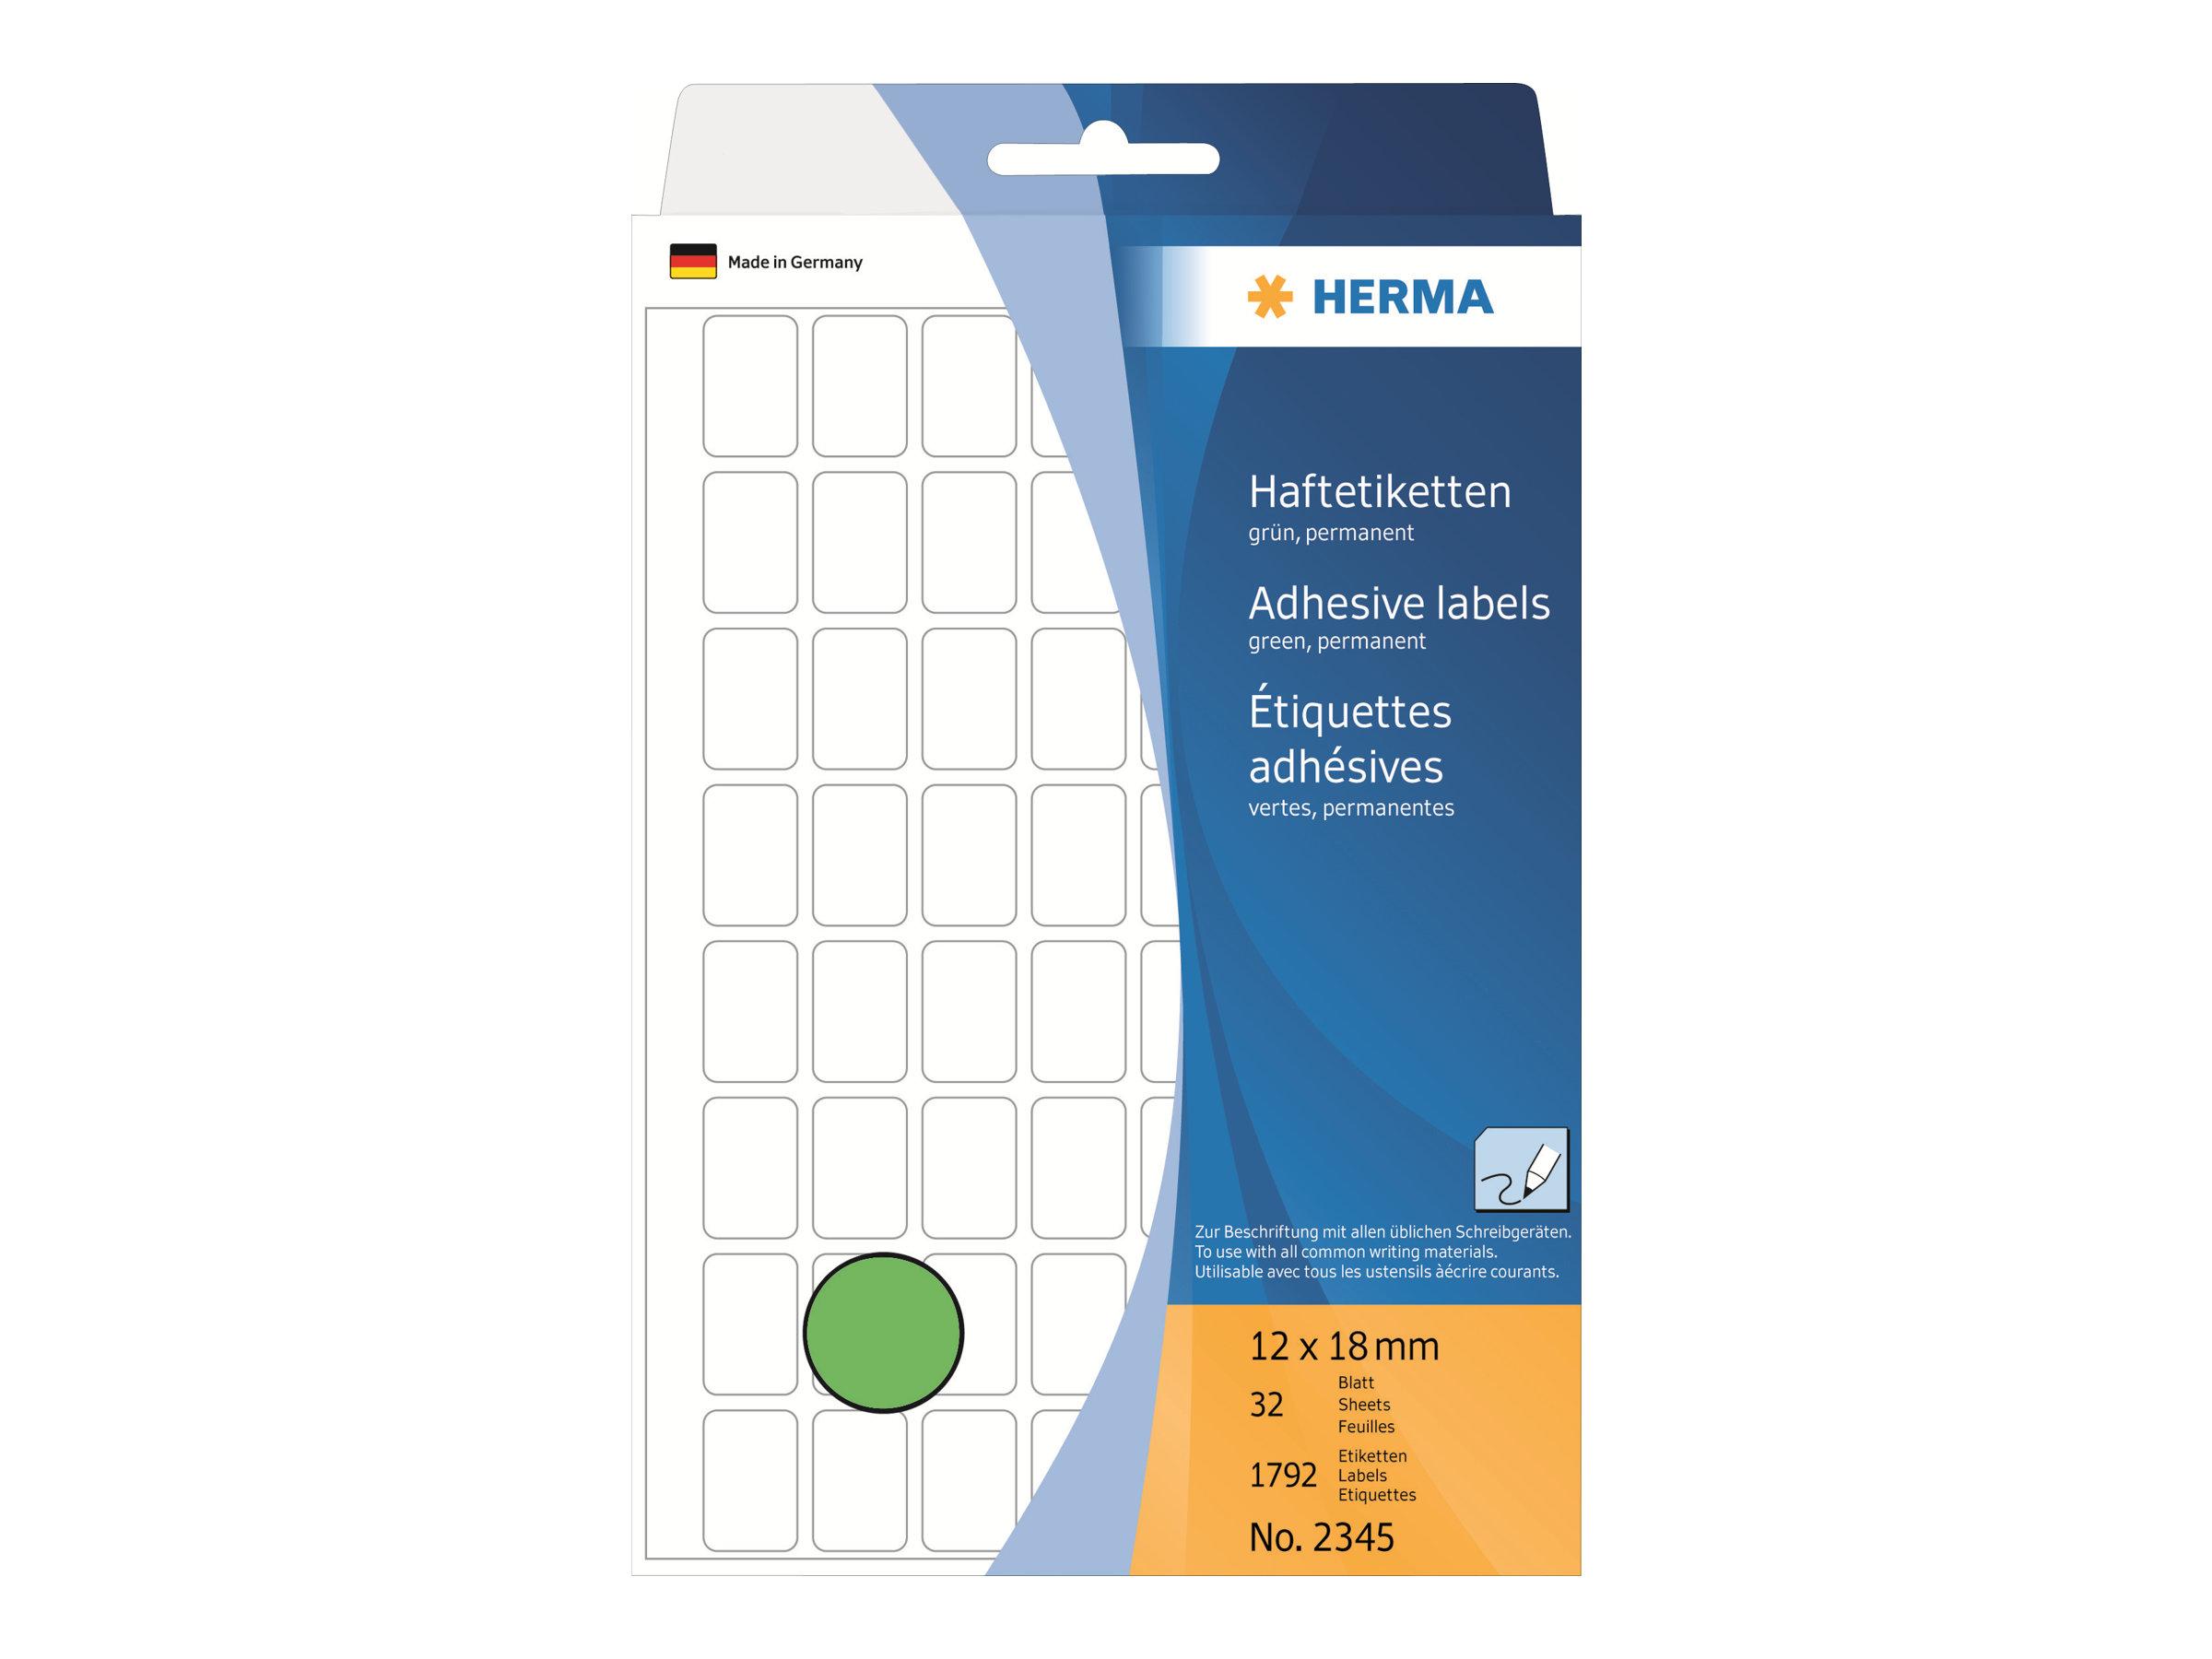 HERMA Permanenter Klebstoff - grün - 12 x 18 mm 1792 Etikett(en) (32 Bogen x 56)